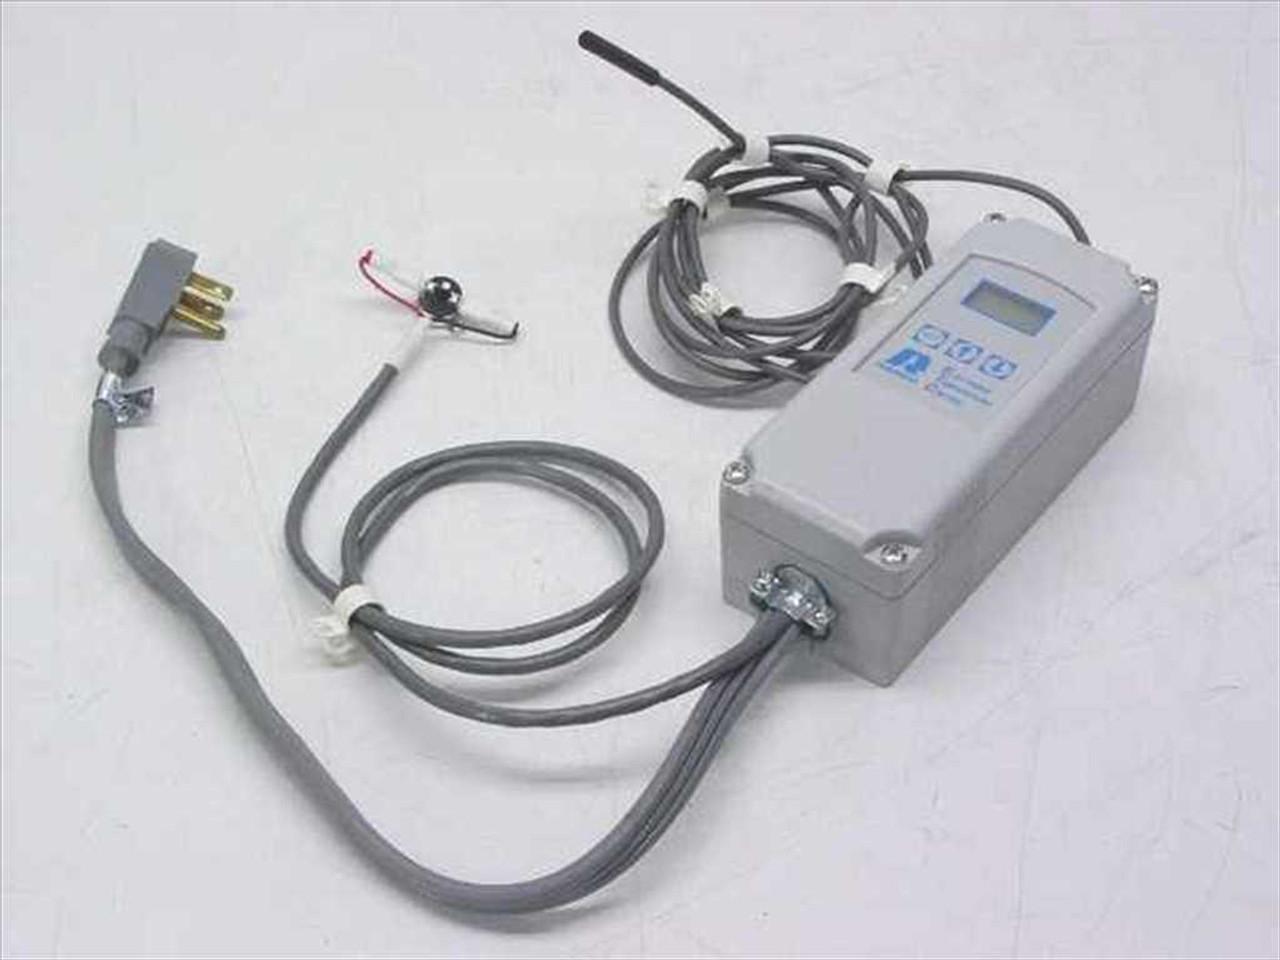 Pleasing Ranco Aquastat Wiring Diagram Humidistat Wiring Diagram Pump Wiring Digital Resources Operbouhousnl